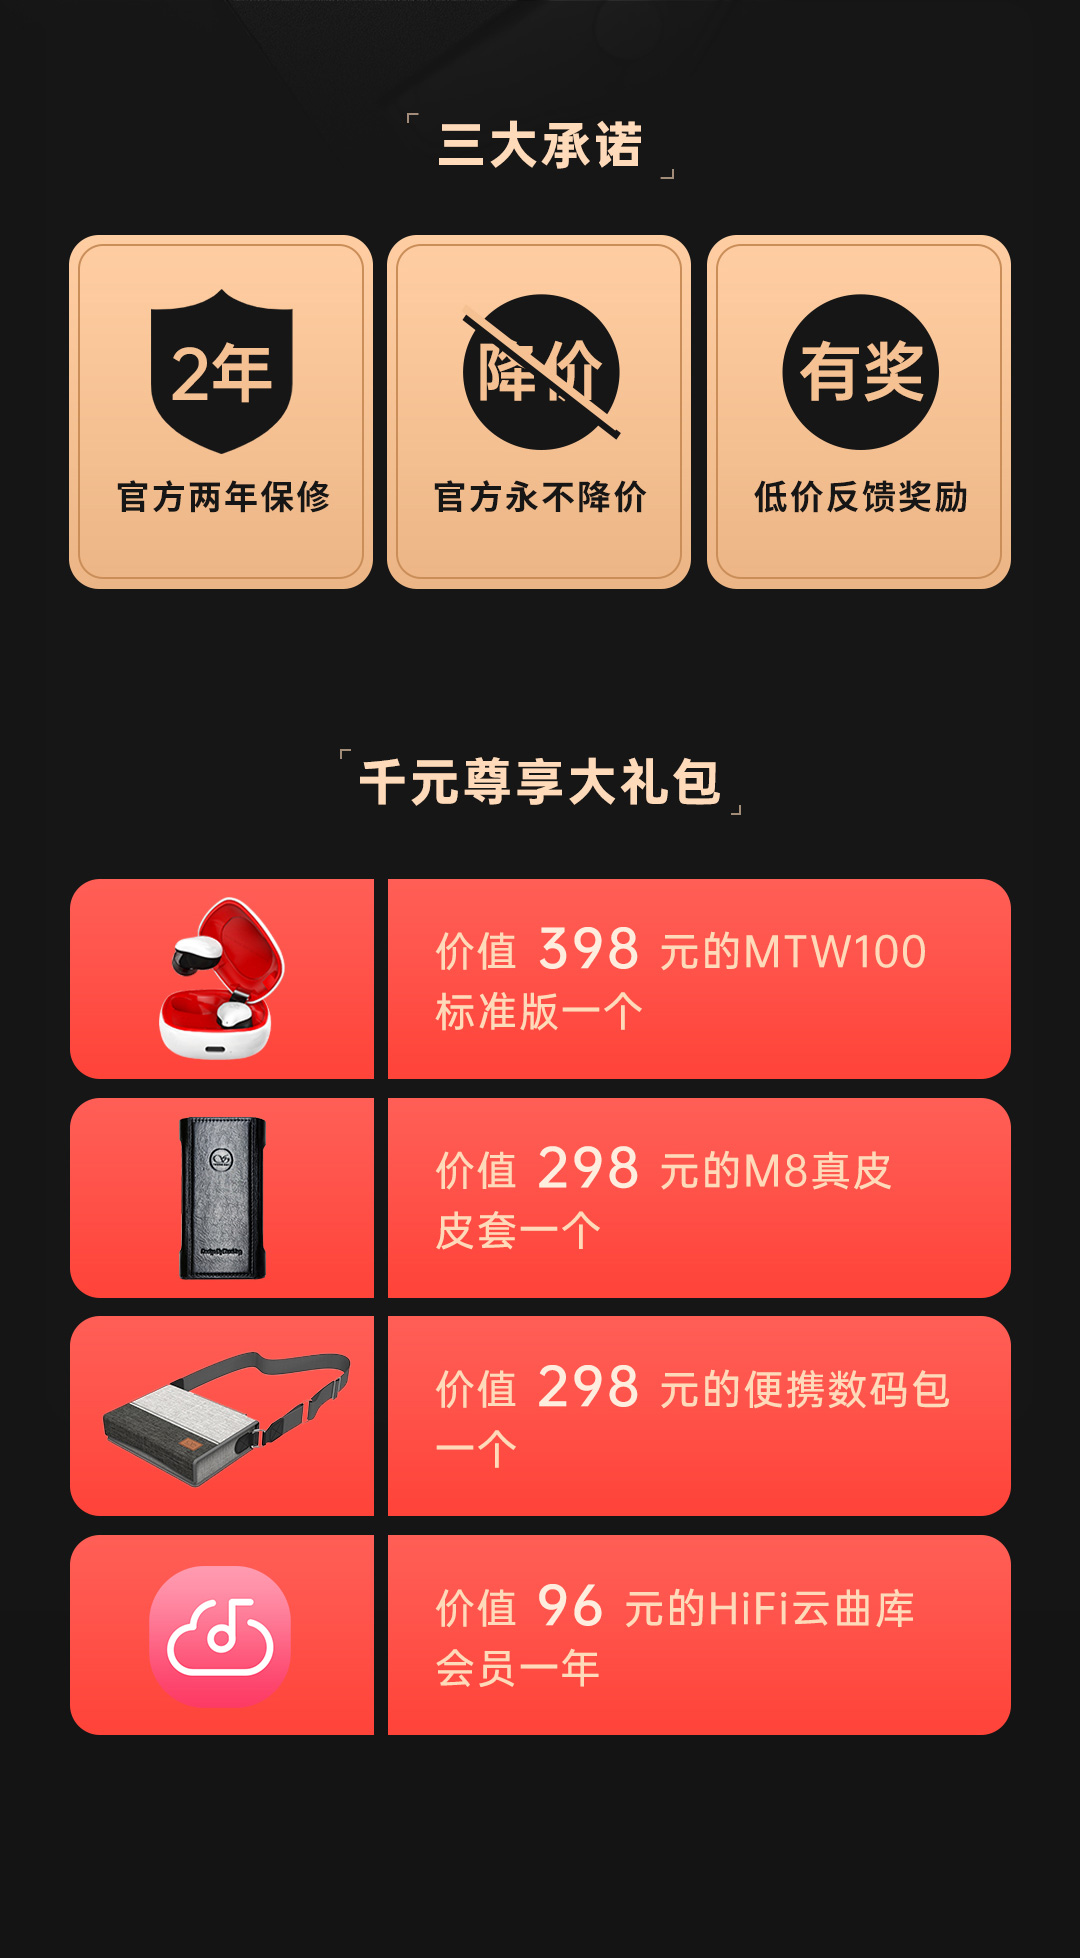 M8-全网开售_02.jpg